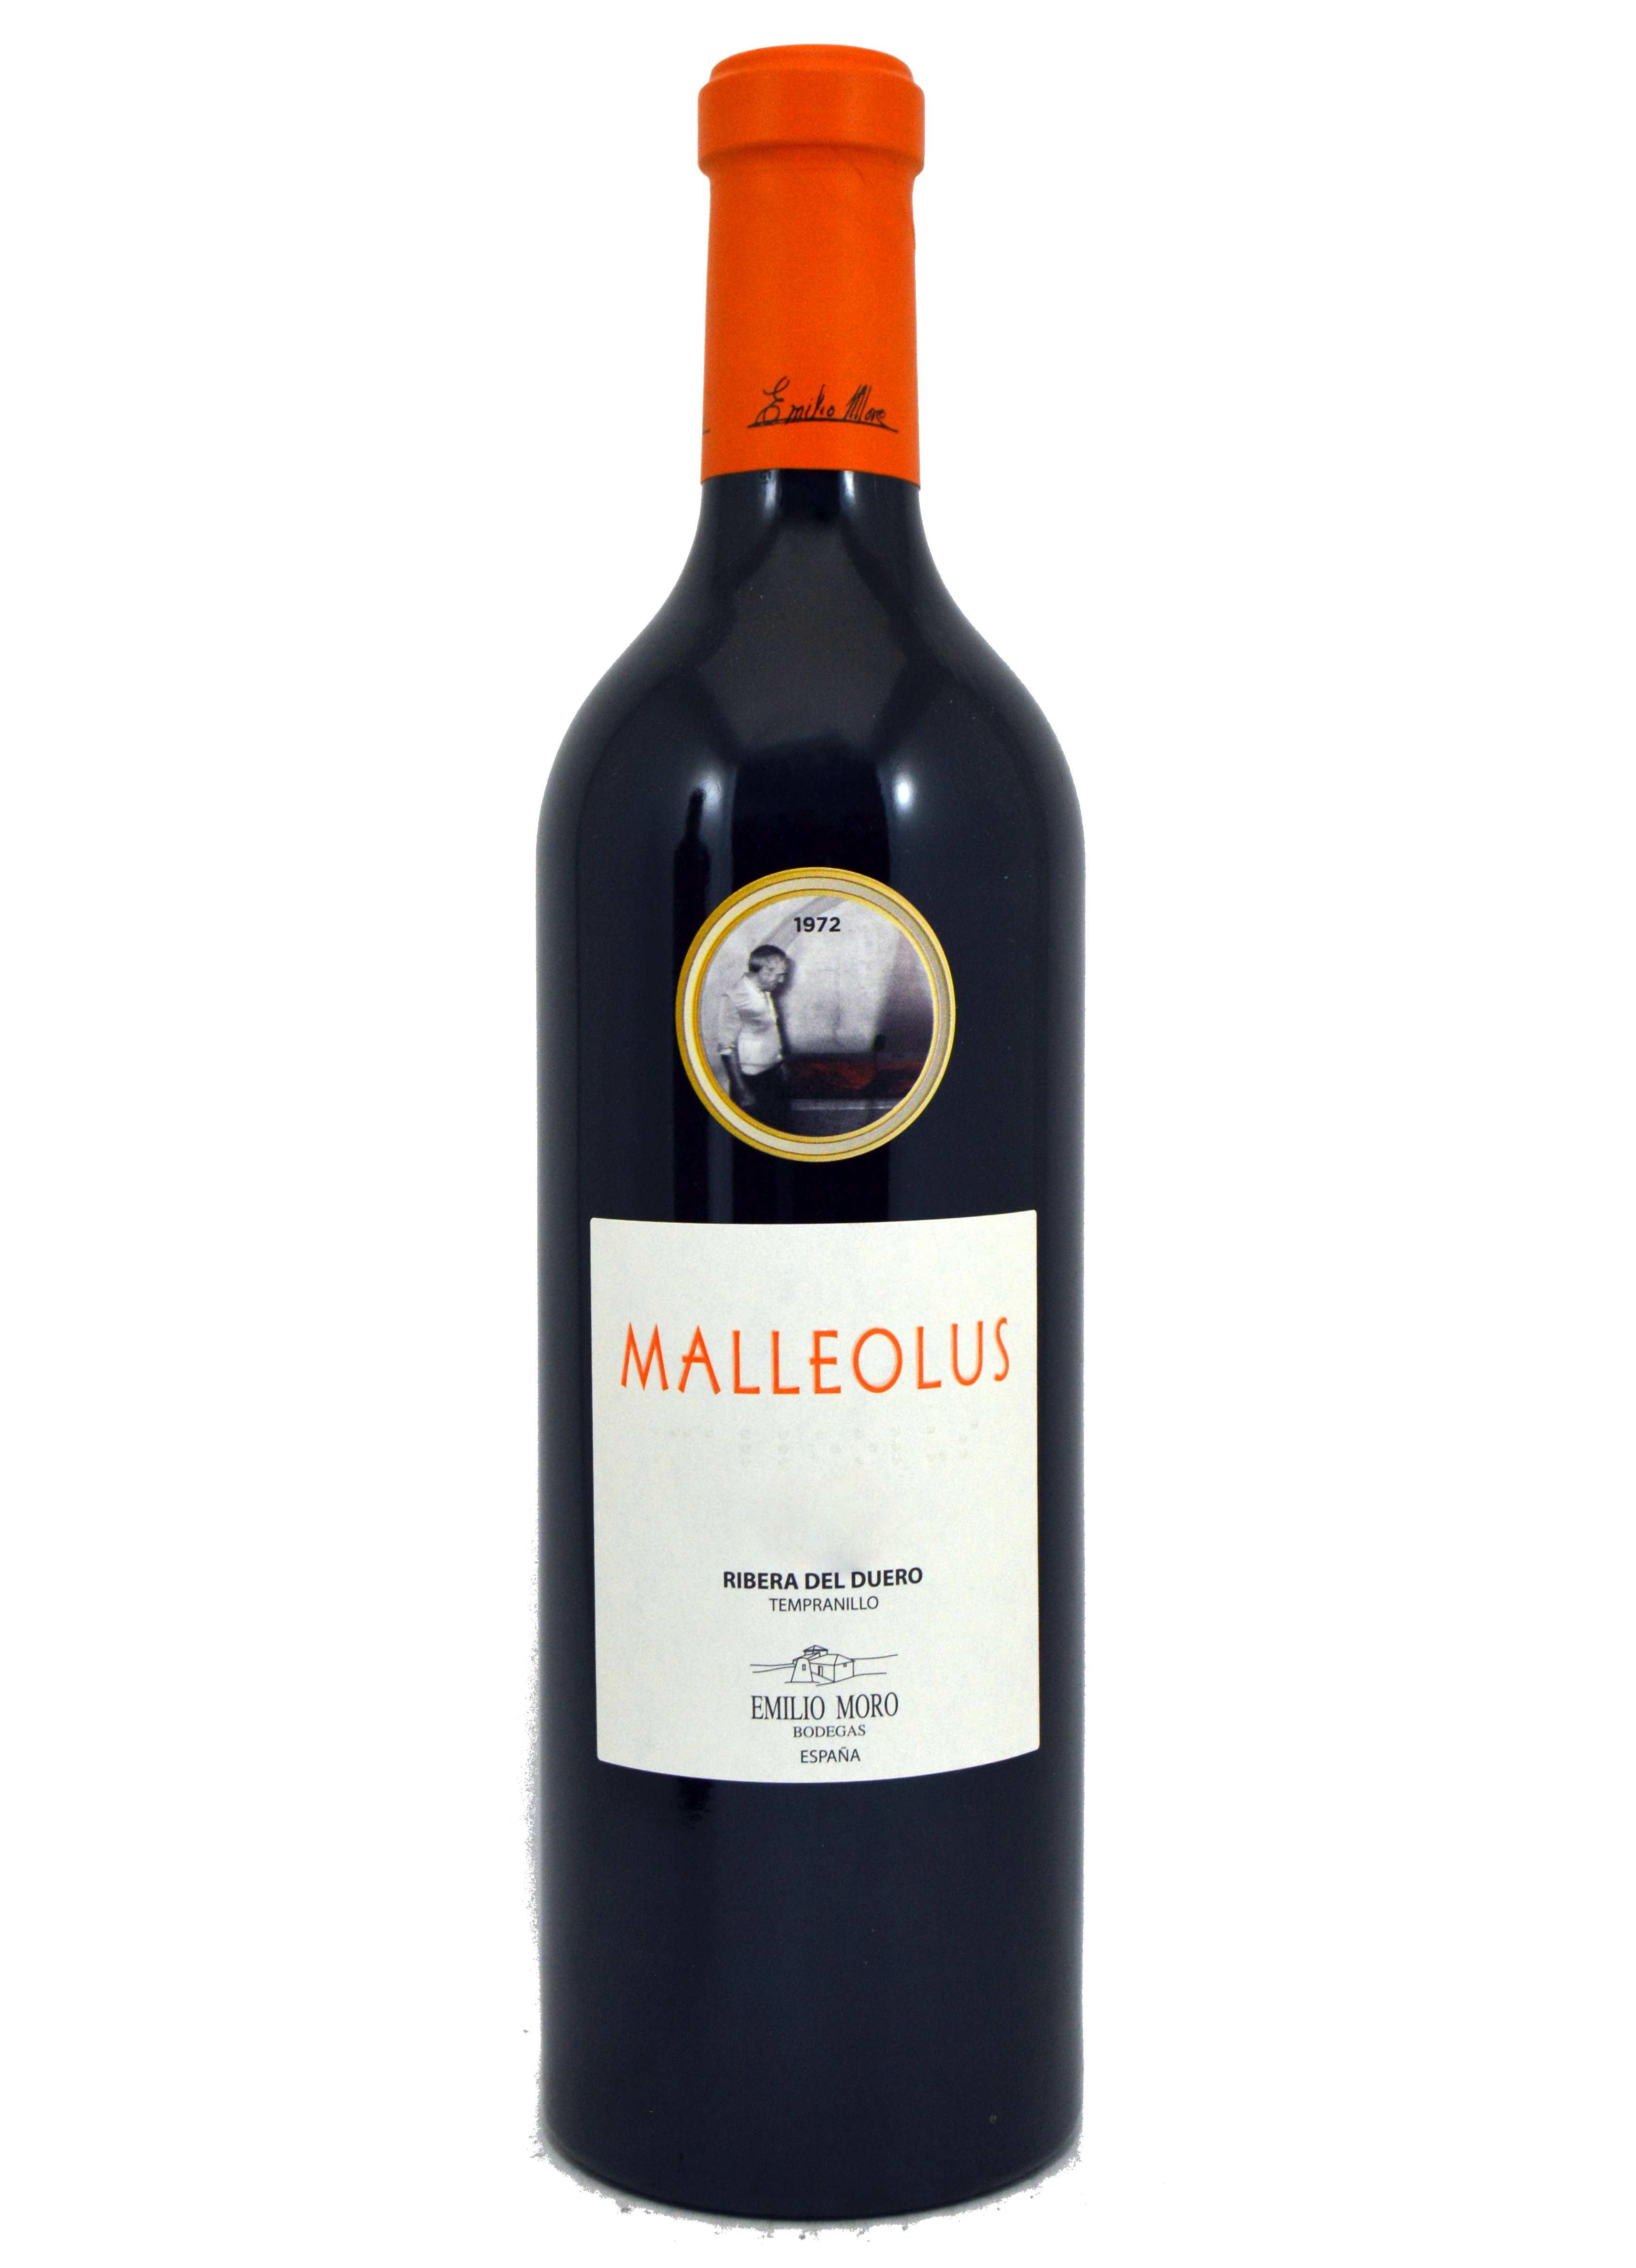 Malleolus